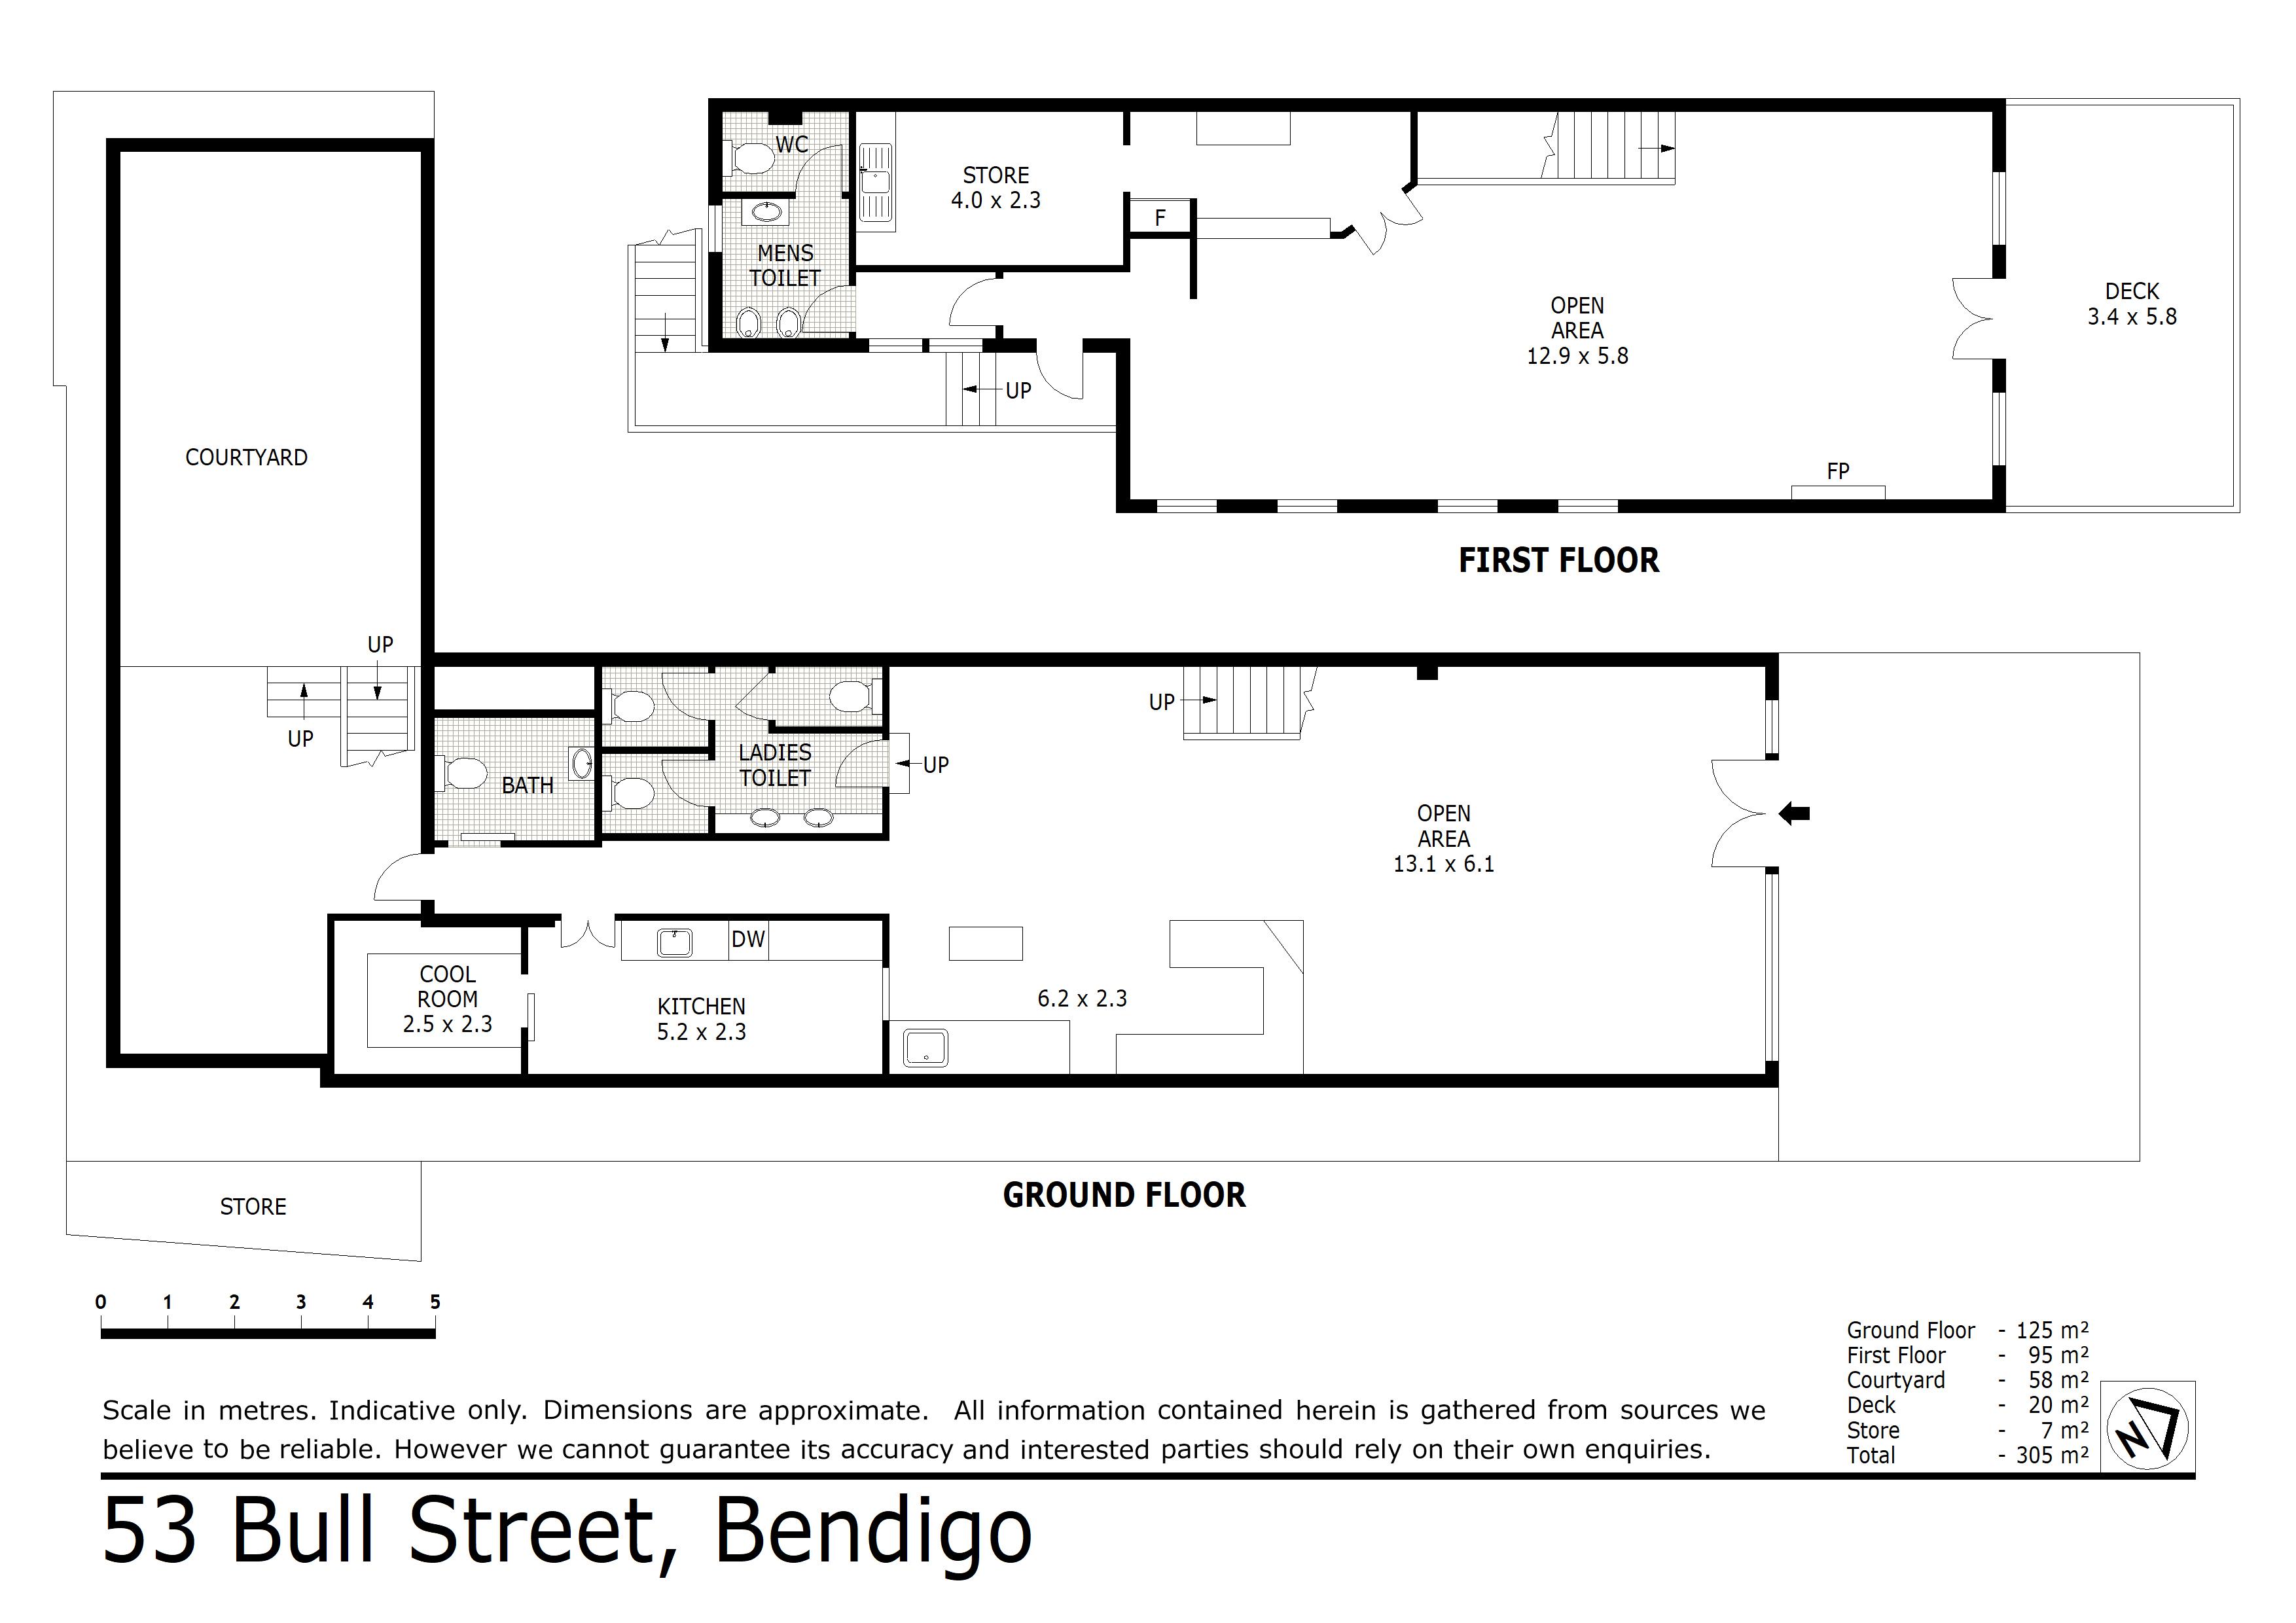 53 Bull Street, Bendigo, VIC 3550